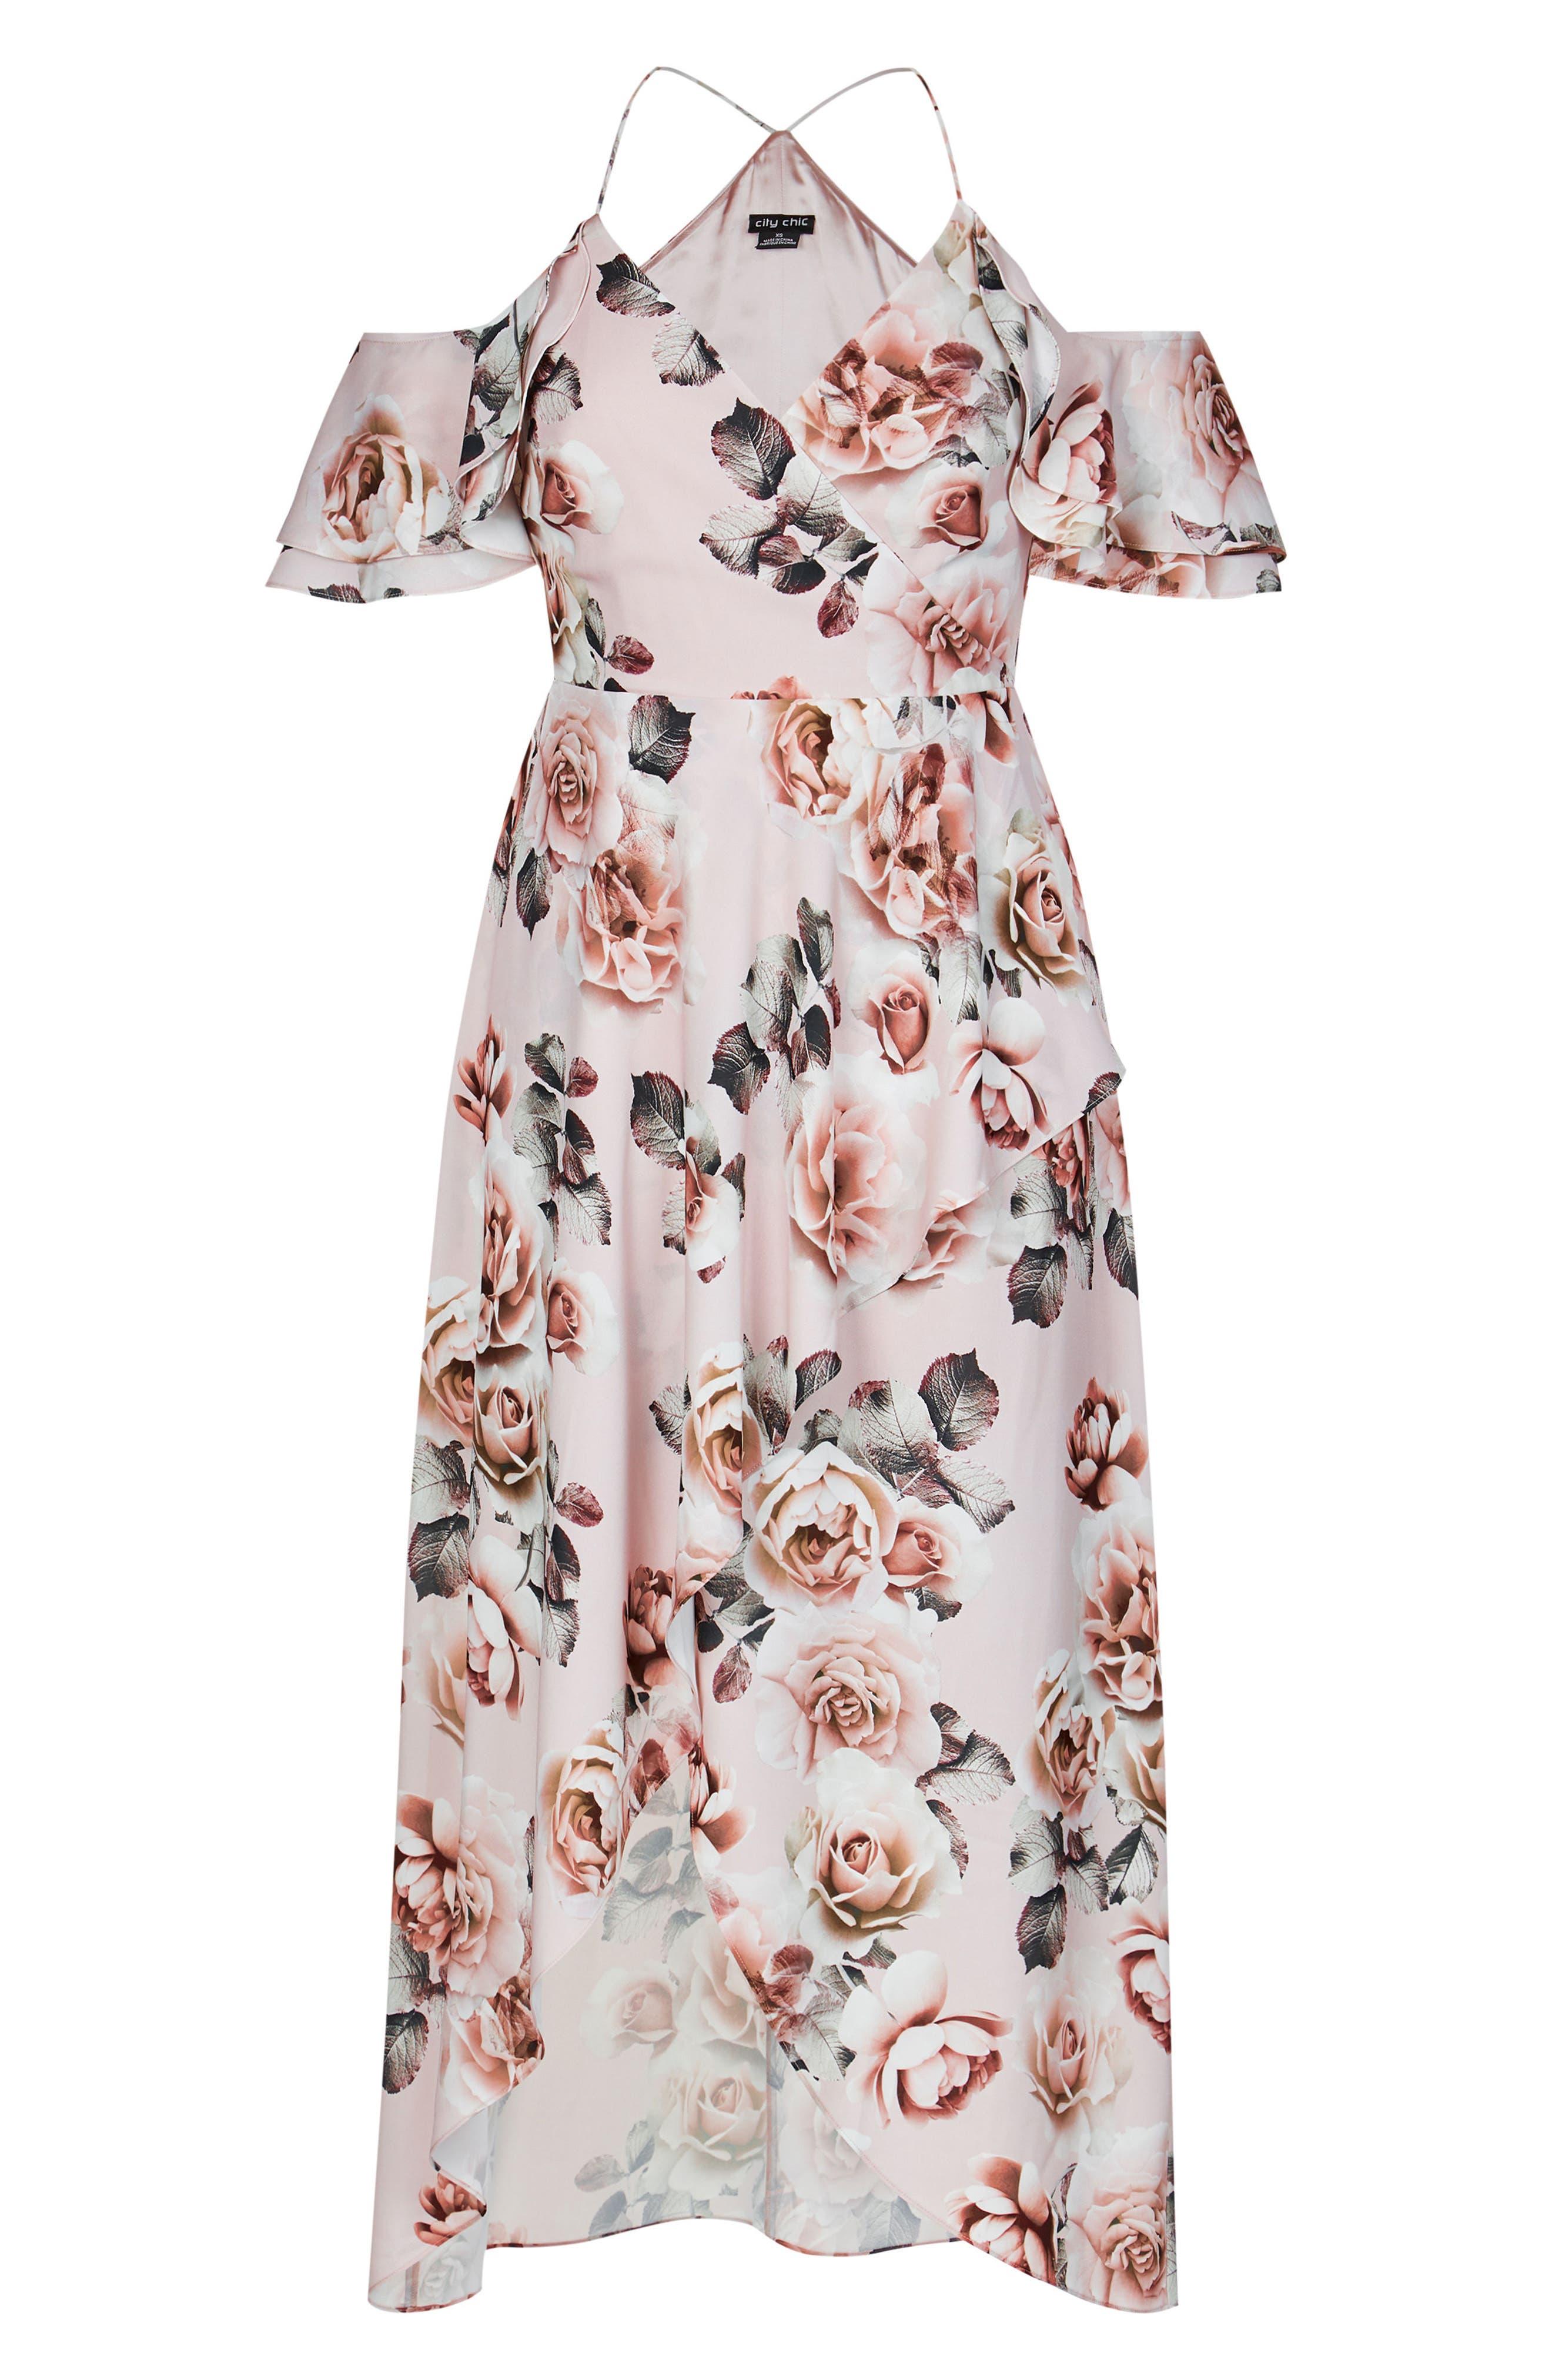 CITY CHIC, Champagne Rose Cold Shoulder Maxi Dress, Alternate thumbnail 3, color, CHAMPAGNE ROSE